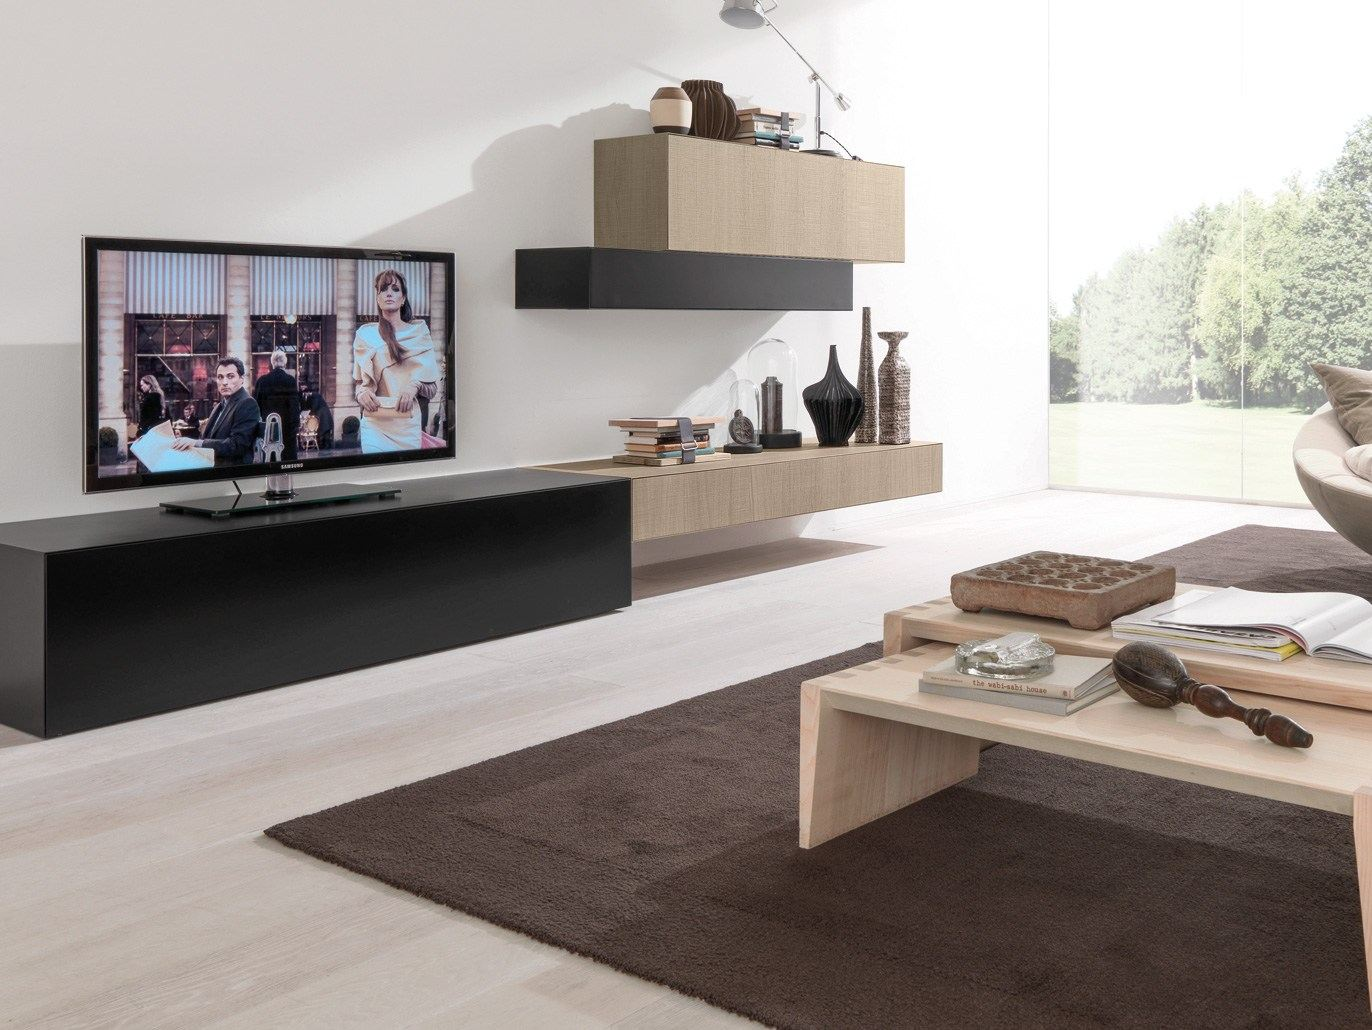 Meuble Tv Mural Slim Une Exclu Atylia Artzein Com # Atylia Meuble Tv